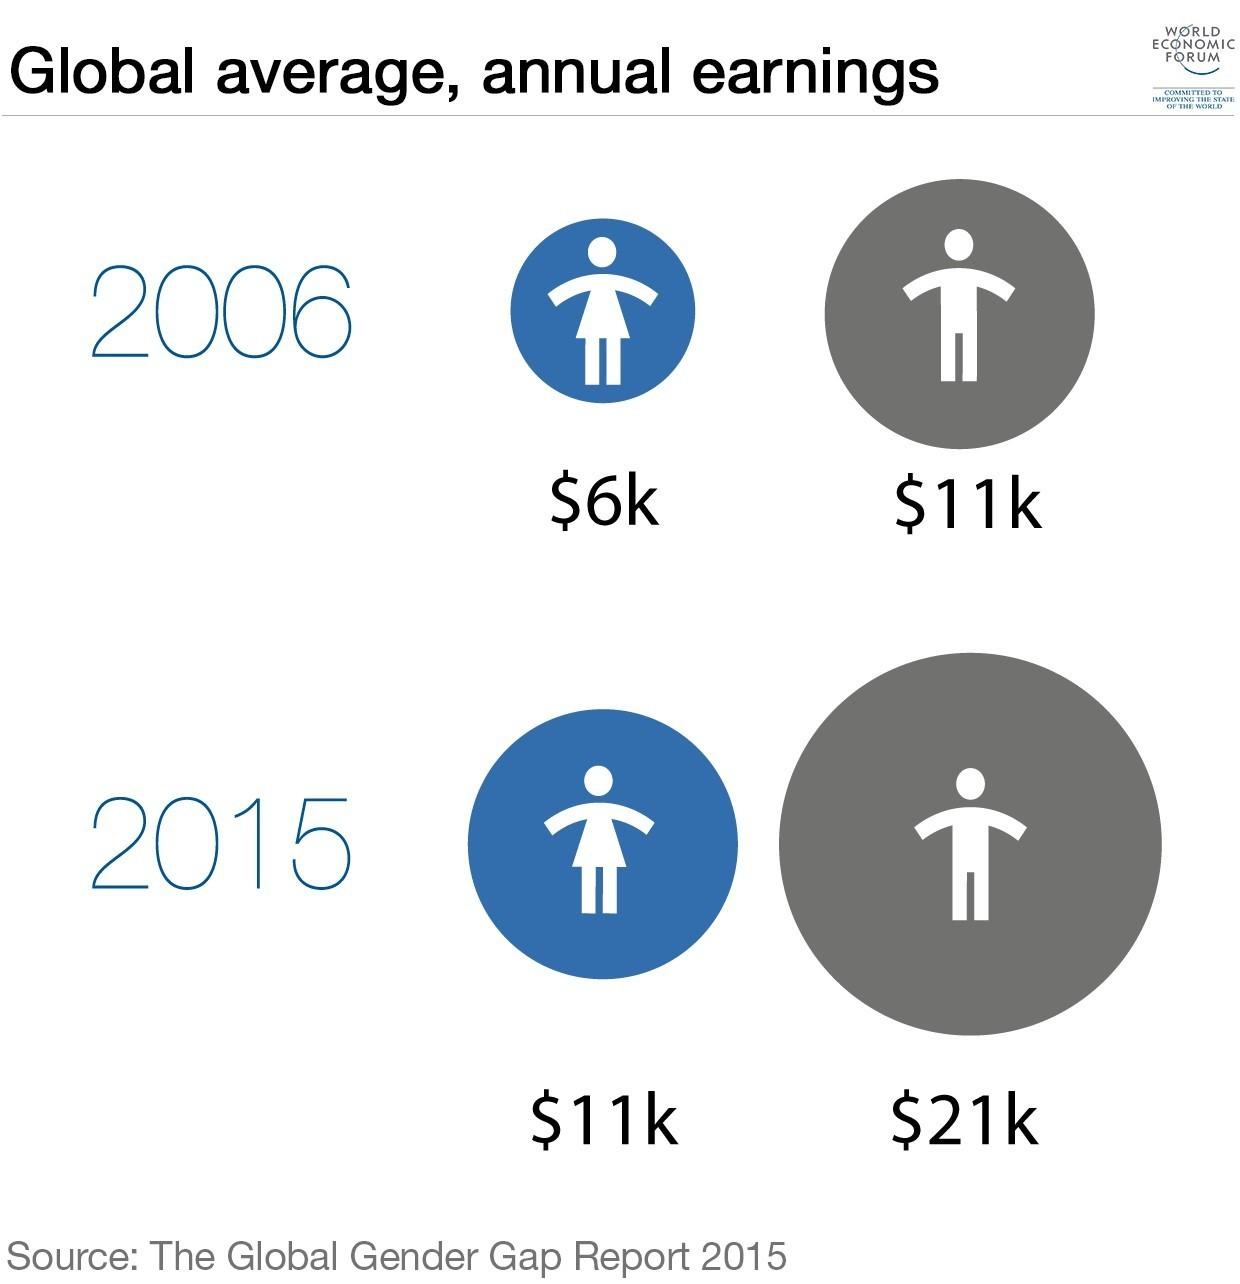 Global average, annual earnings